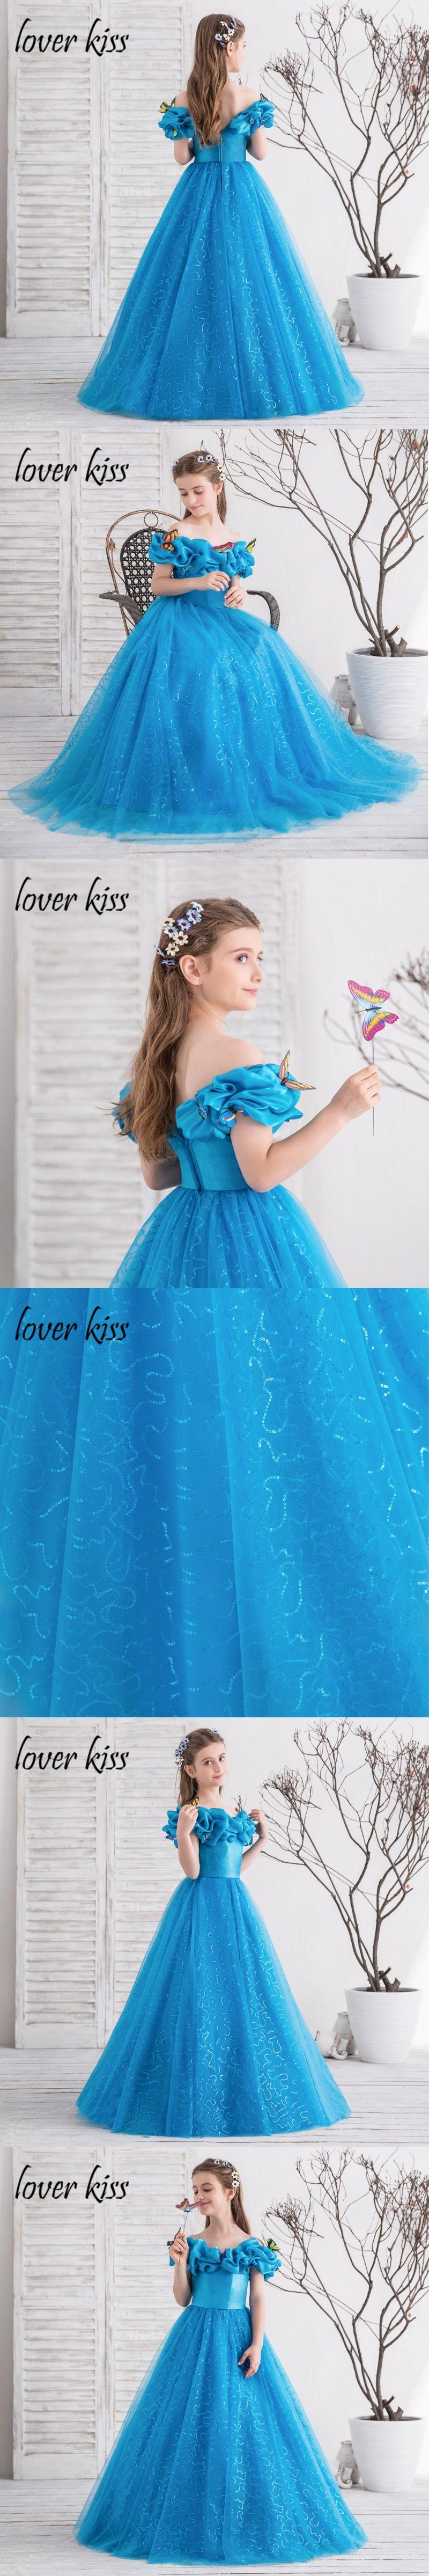 Lover Kiss 2018 Flower Girls Dress Blue Off Shoulder Kids Birthday ...